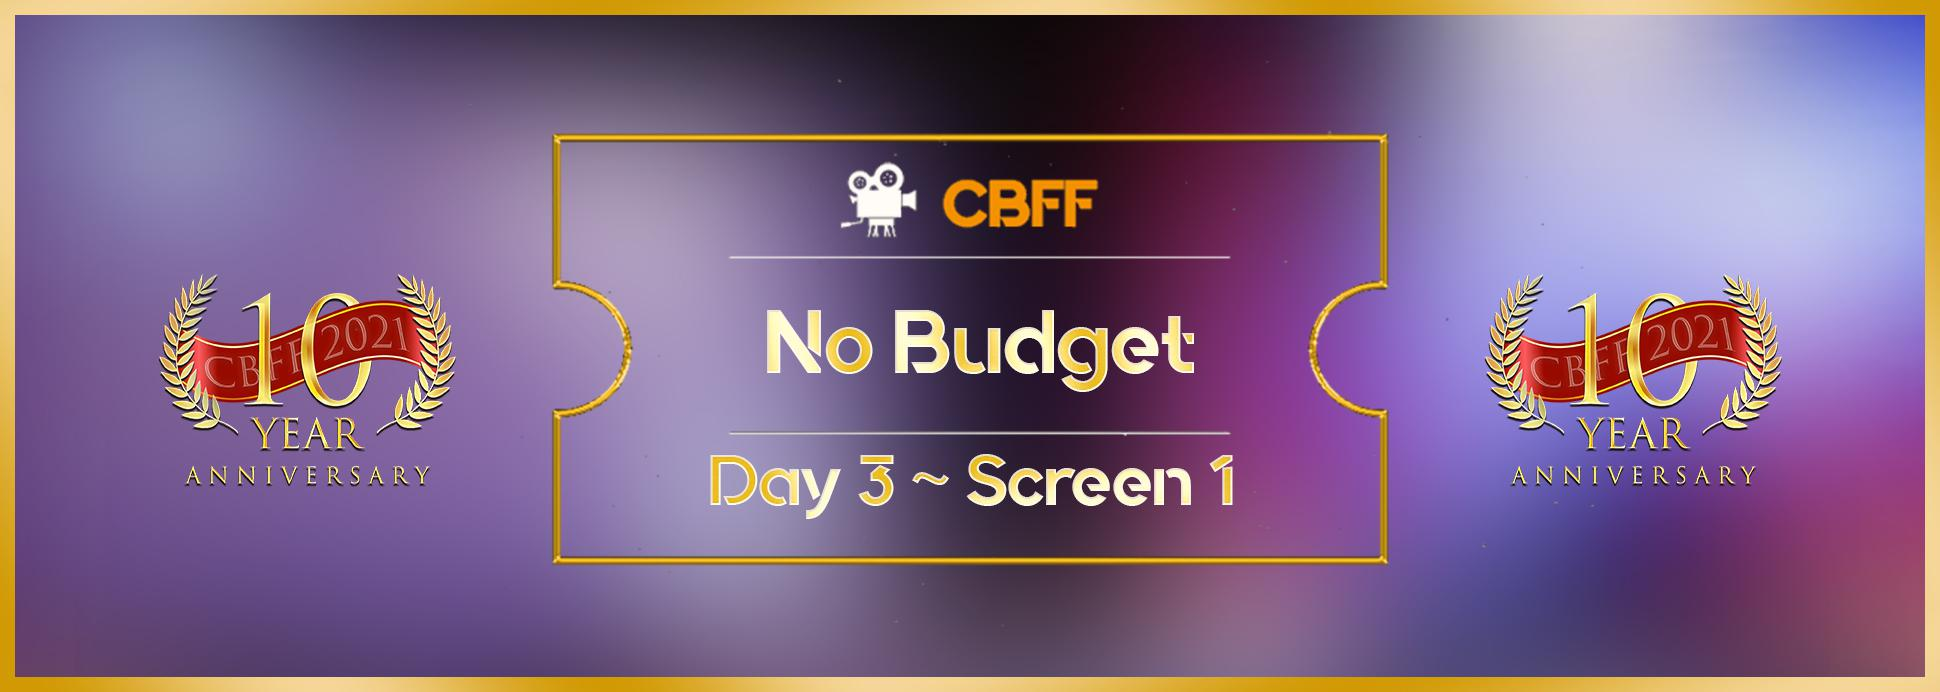 Day 3, Screen 1: No Budget Short